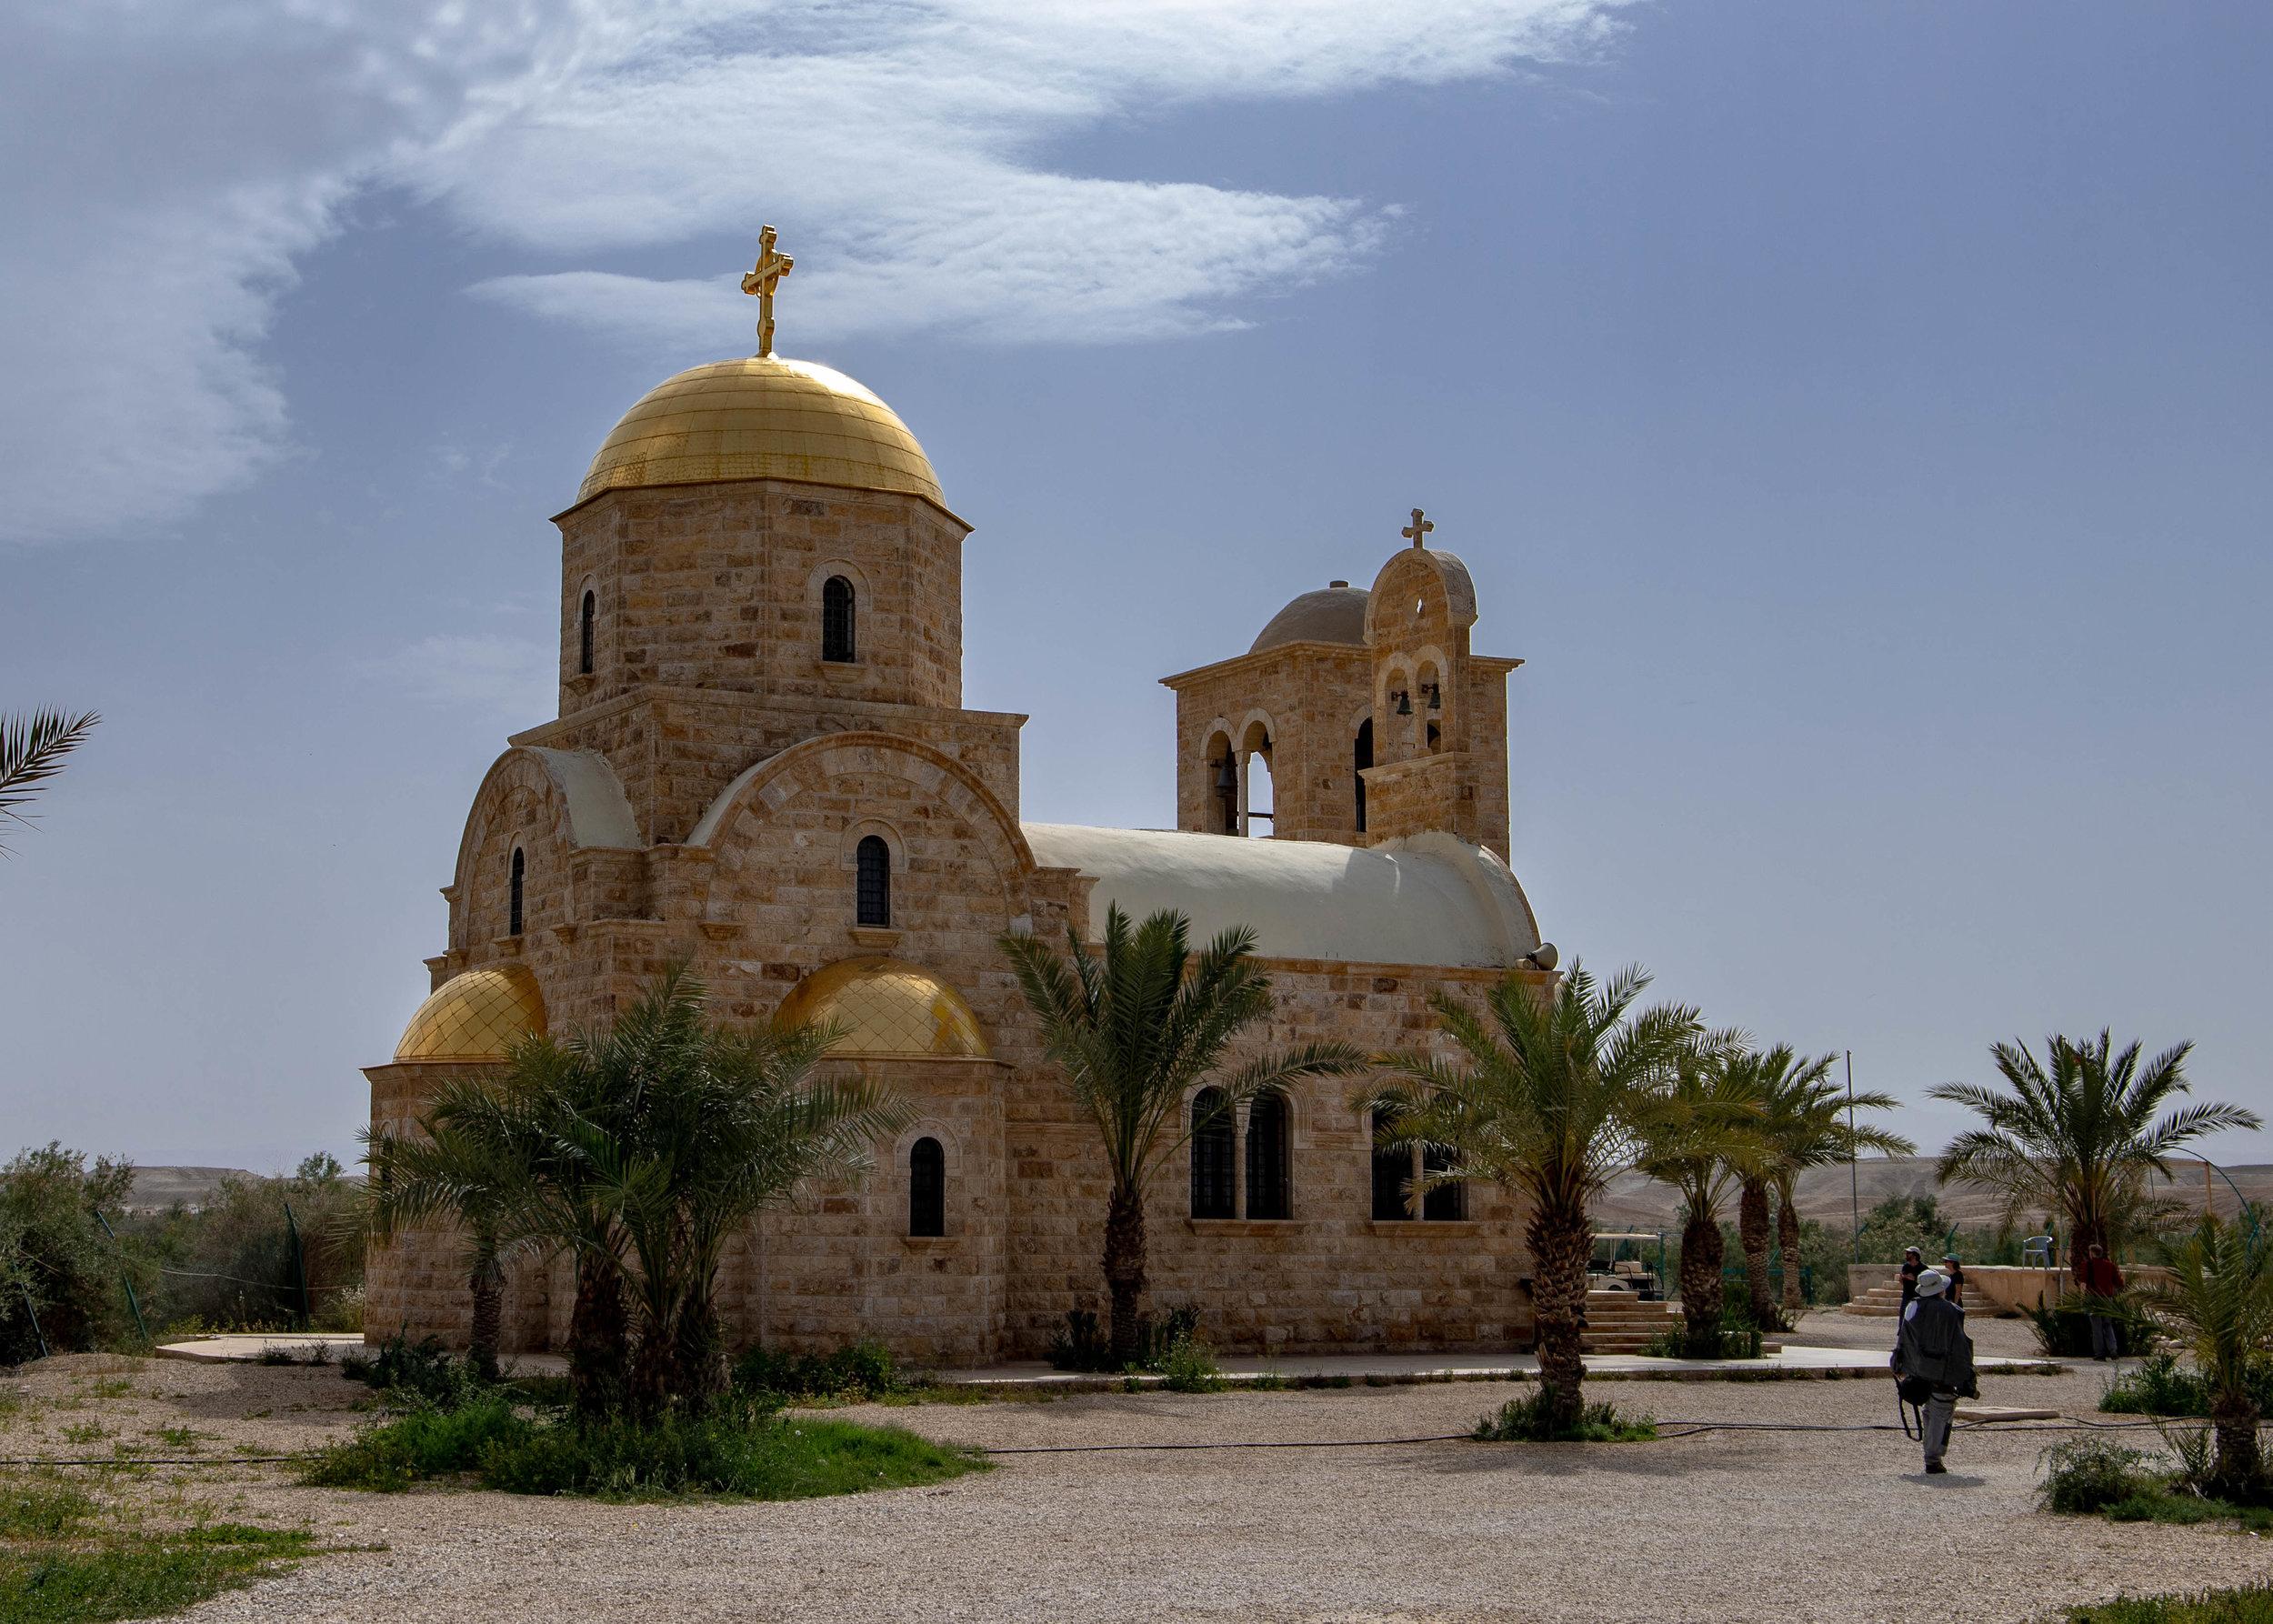 The striking Greek Orthodox Monastery of St John the Baptist.